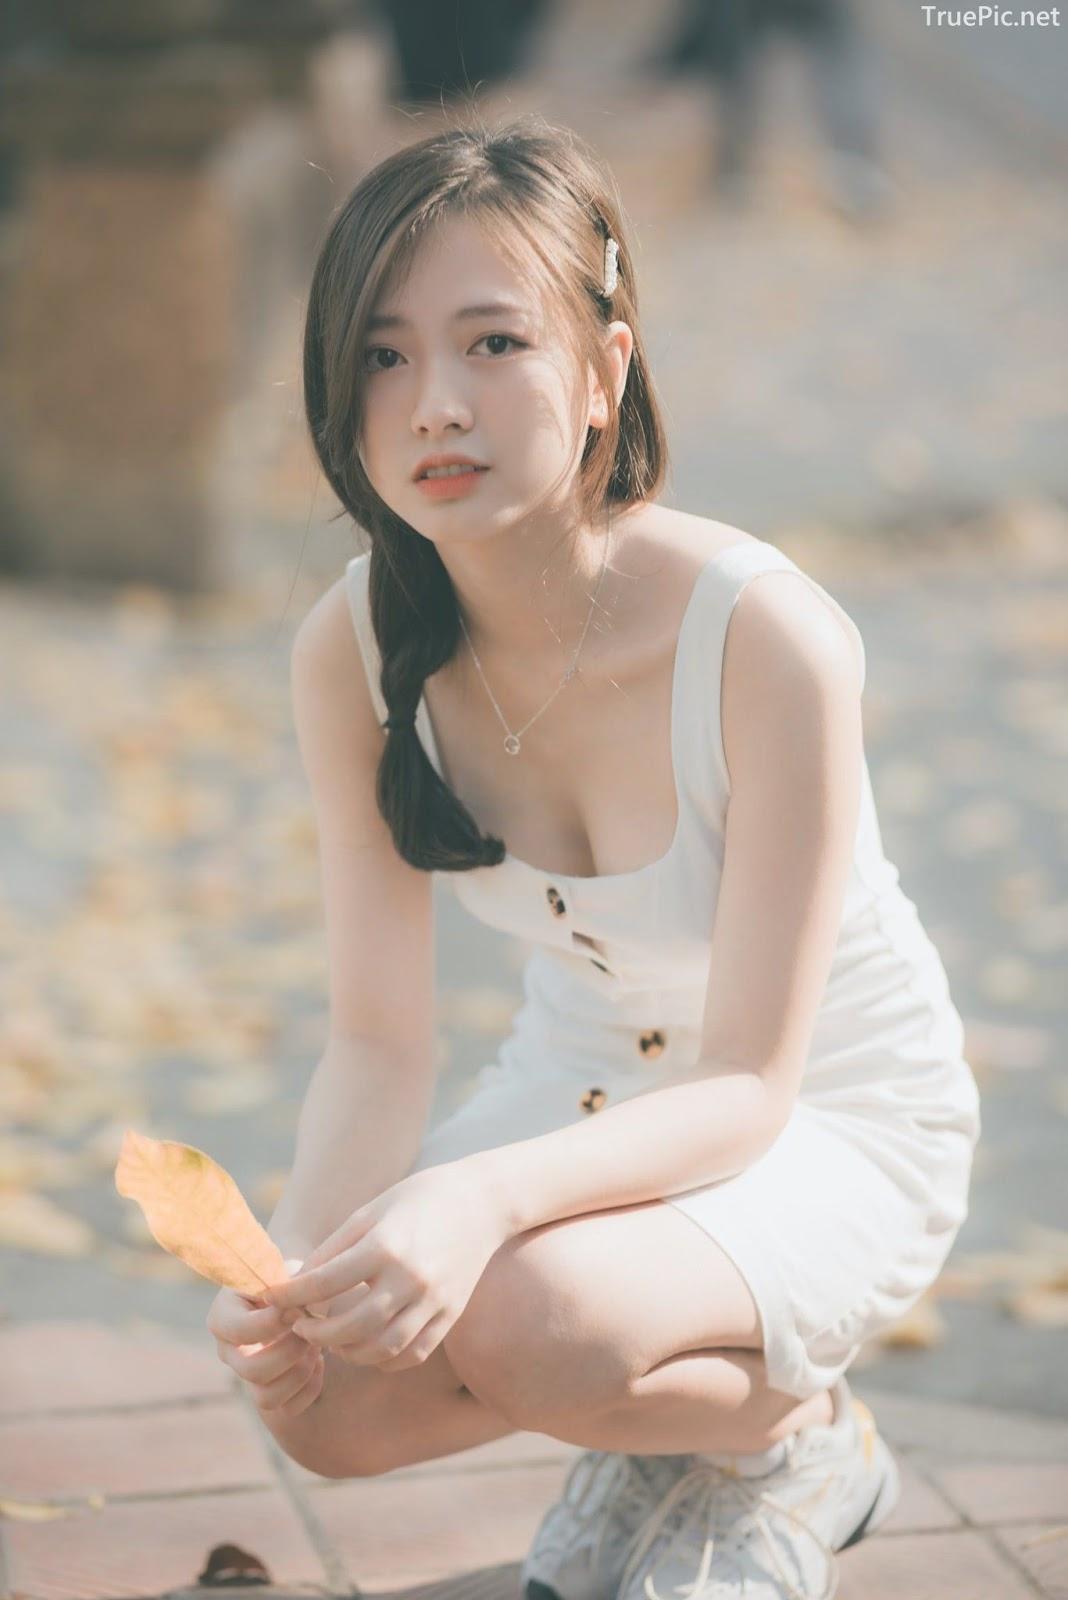 Vietnamese Hot Girl Linh Hoai - Season of falling leaves - TruePic.net - Picture 3